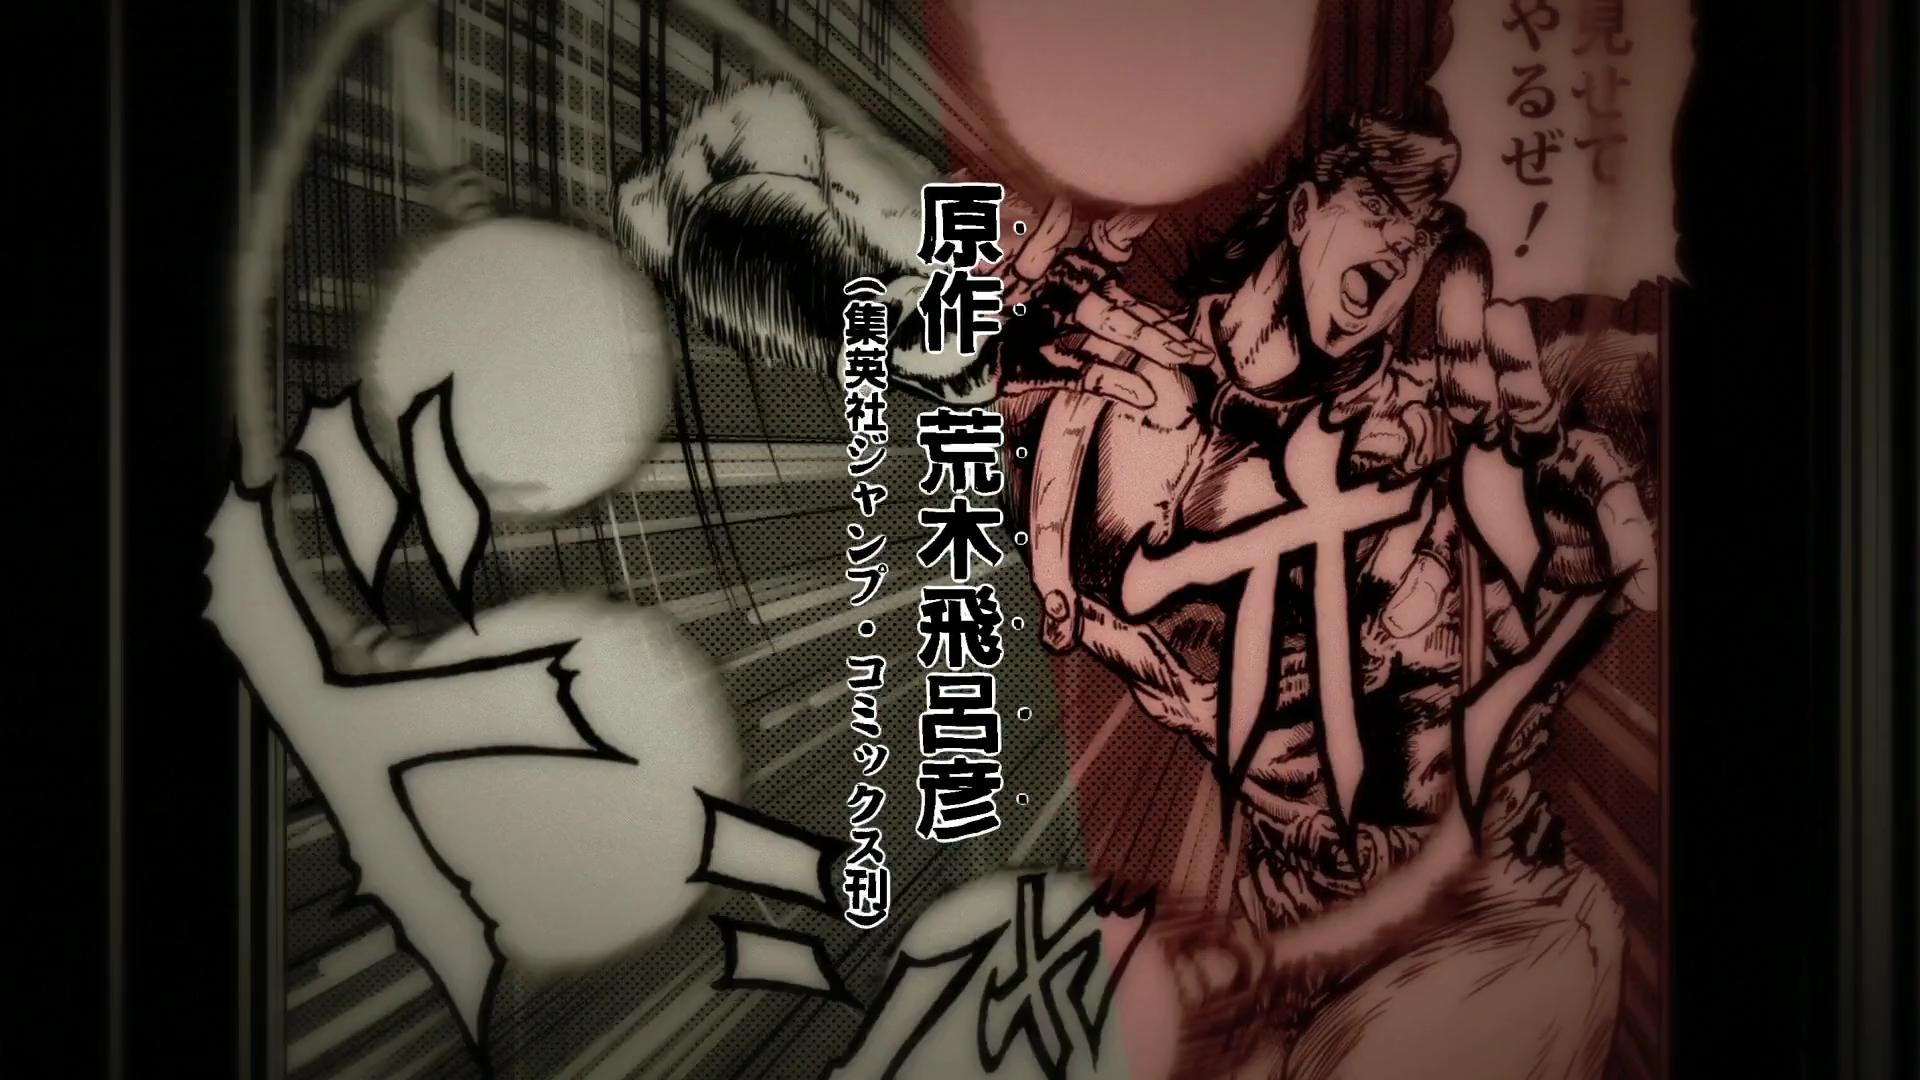 JosephCrackerVolley AnimePartIOP1